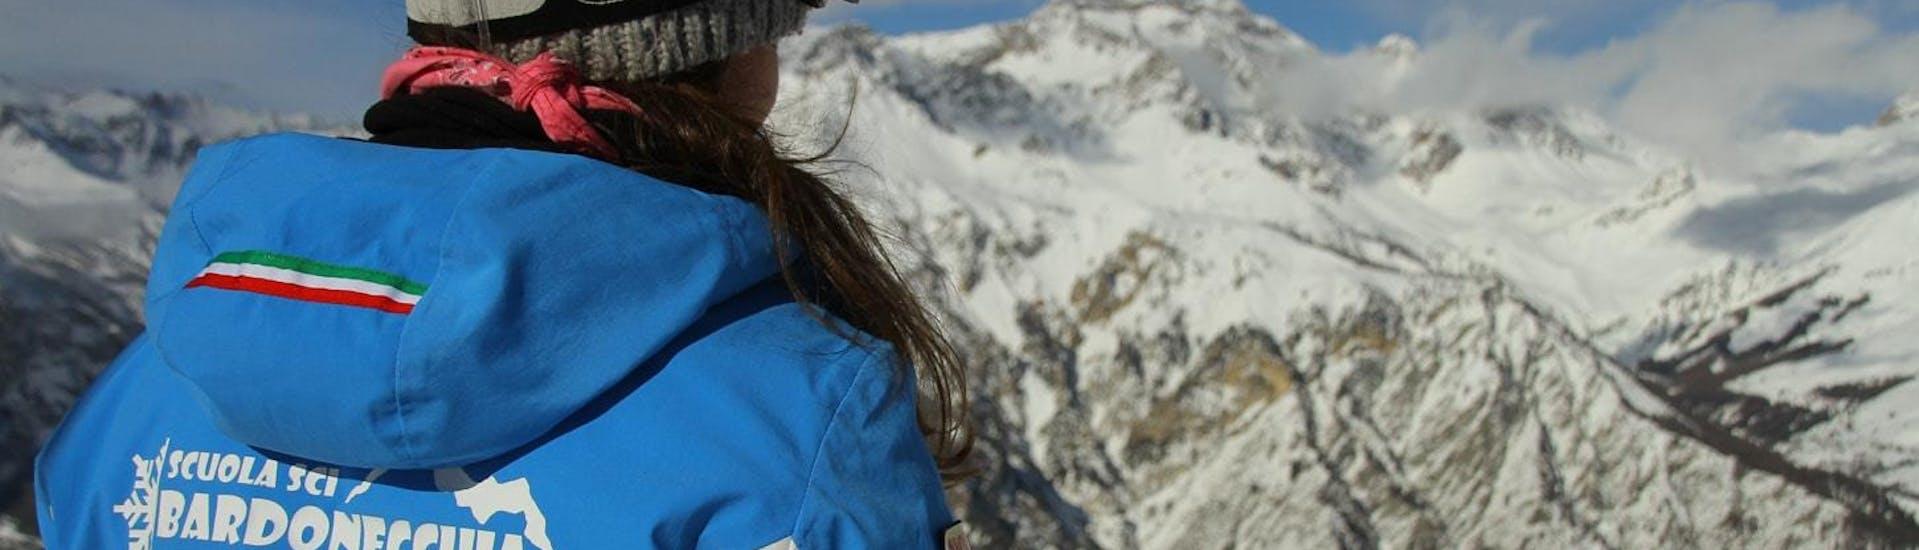 A ski instructor from the ski school Scuola di Sci Bardonecchia supervises the progress of his student during the Private Ski Lessons for Adults - Low Season.